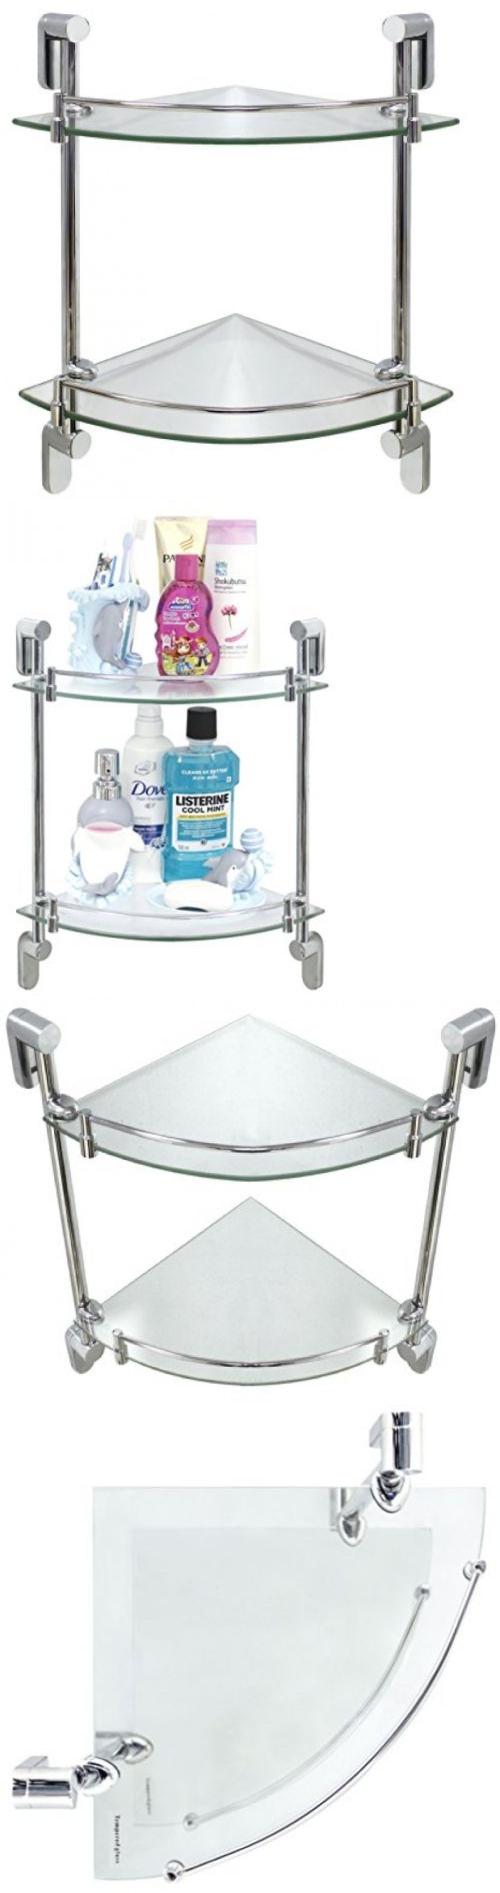 Glass shelf with rail for bathroom - Shelves 31385 Double Corner Glass Shelf Rail Rack Bathroom Storage Organizer Shower Toilet New